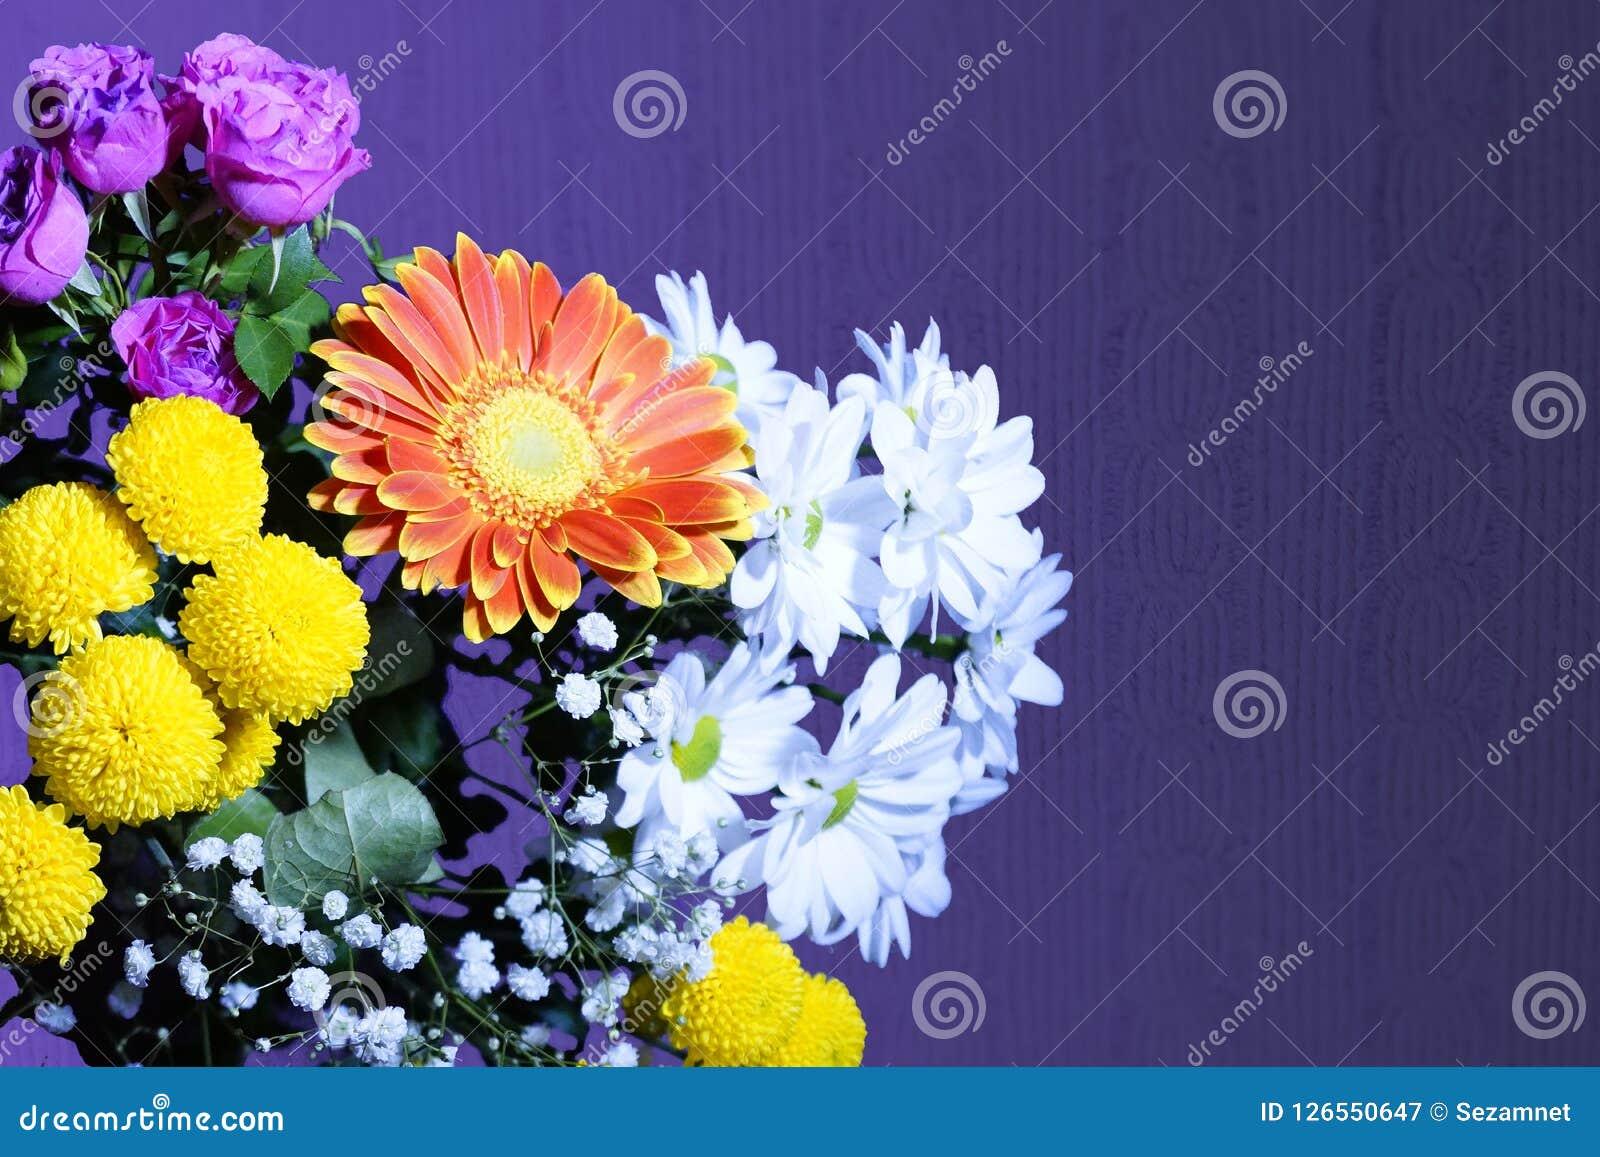 Flower Arrangement Of Orange White Pink Yellow Flowers Stock Image